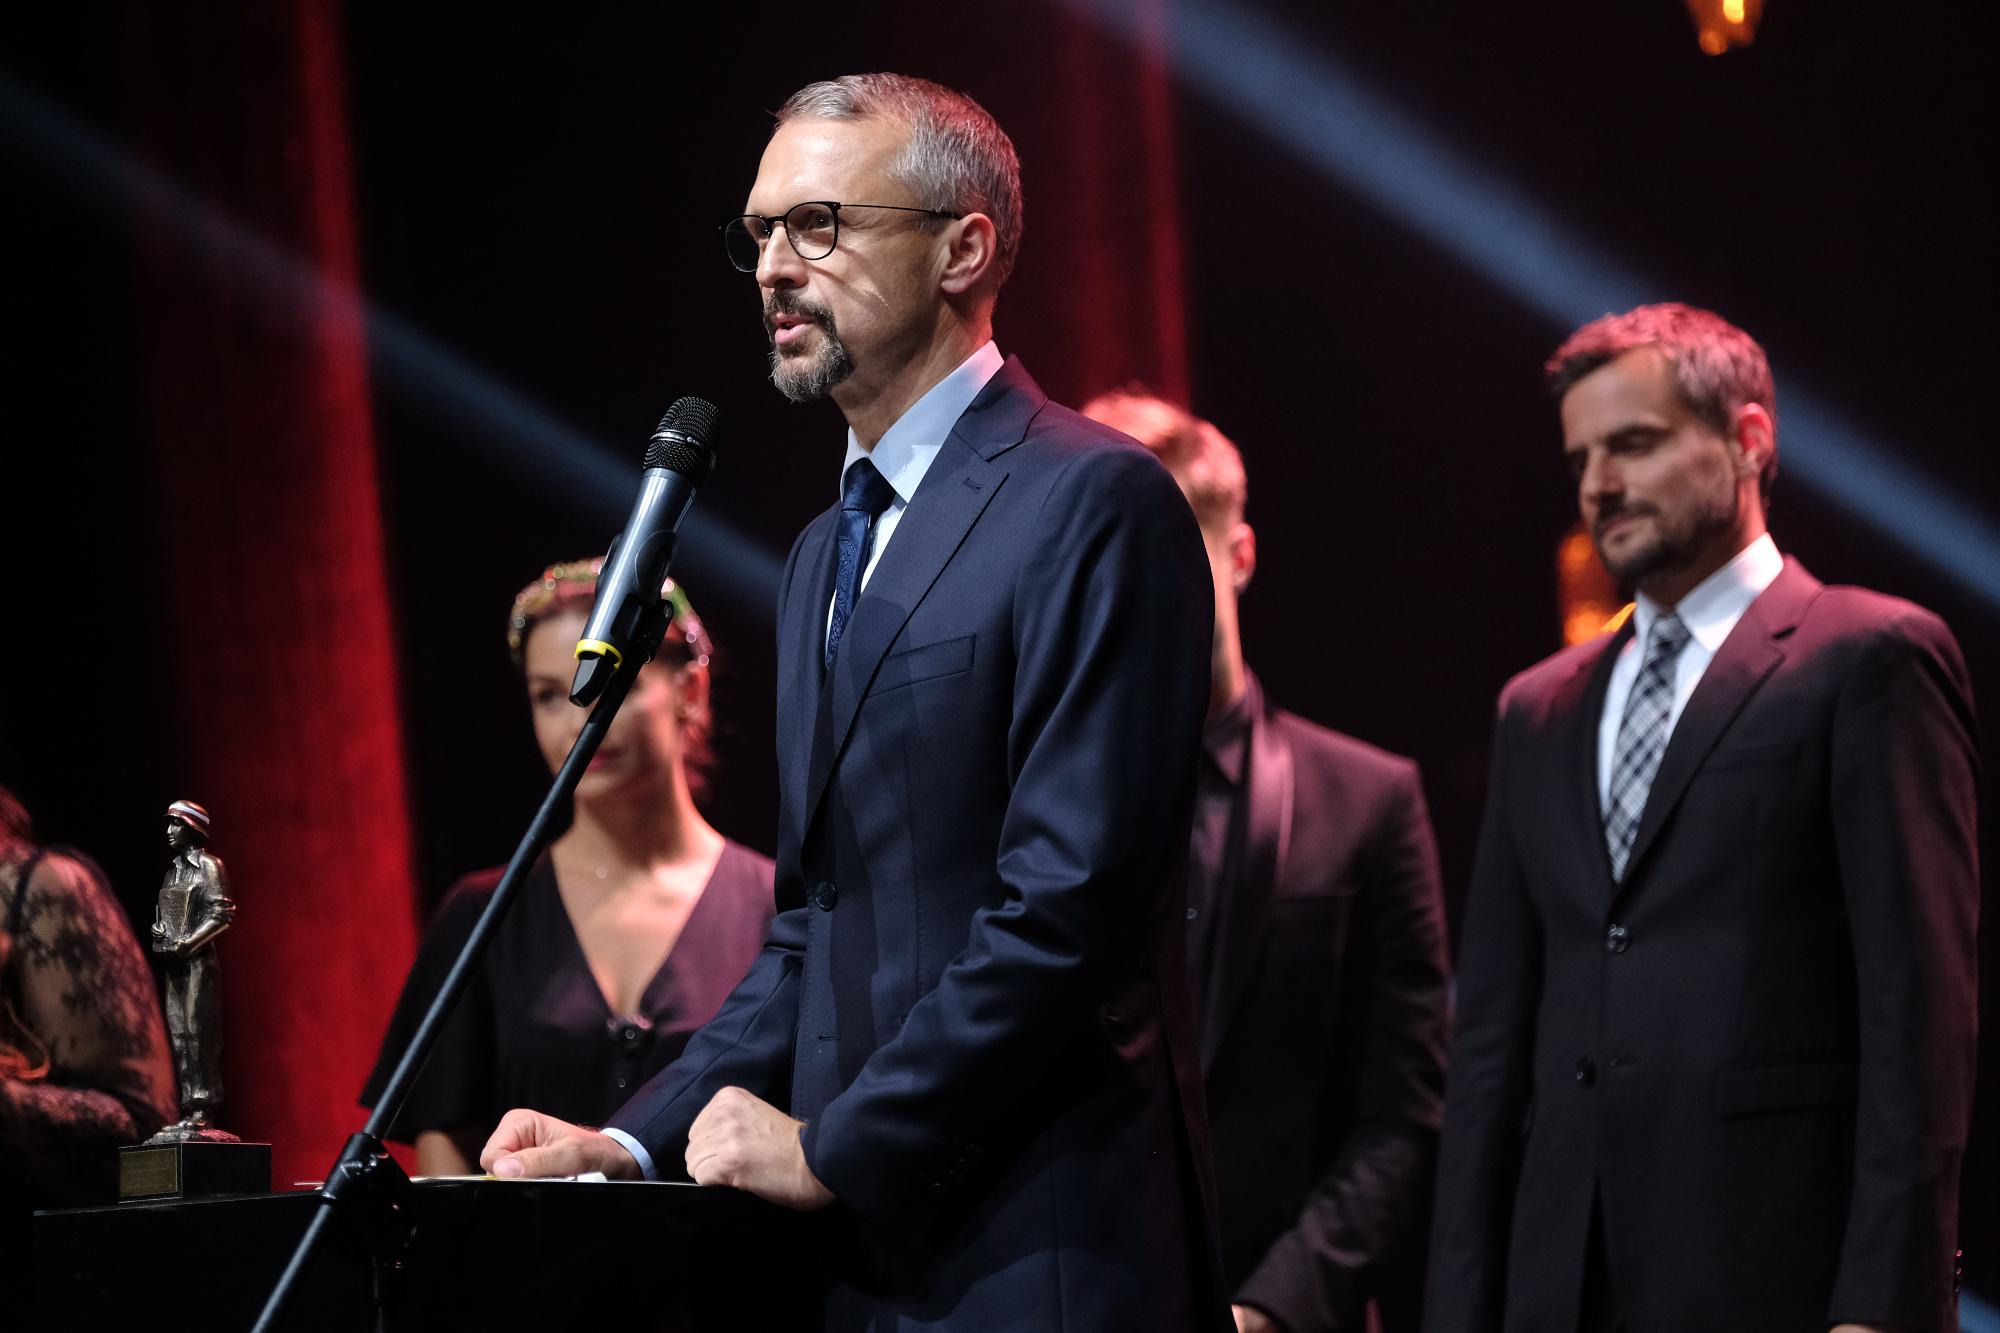 Gala_BohaterONy_2019_fot_Piotr_Litwic (92)